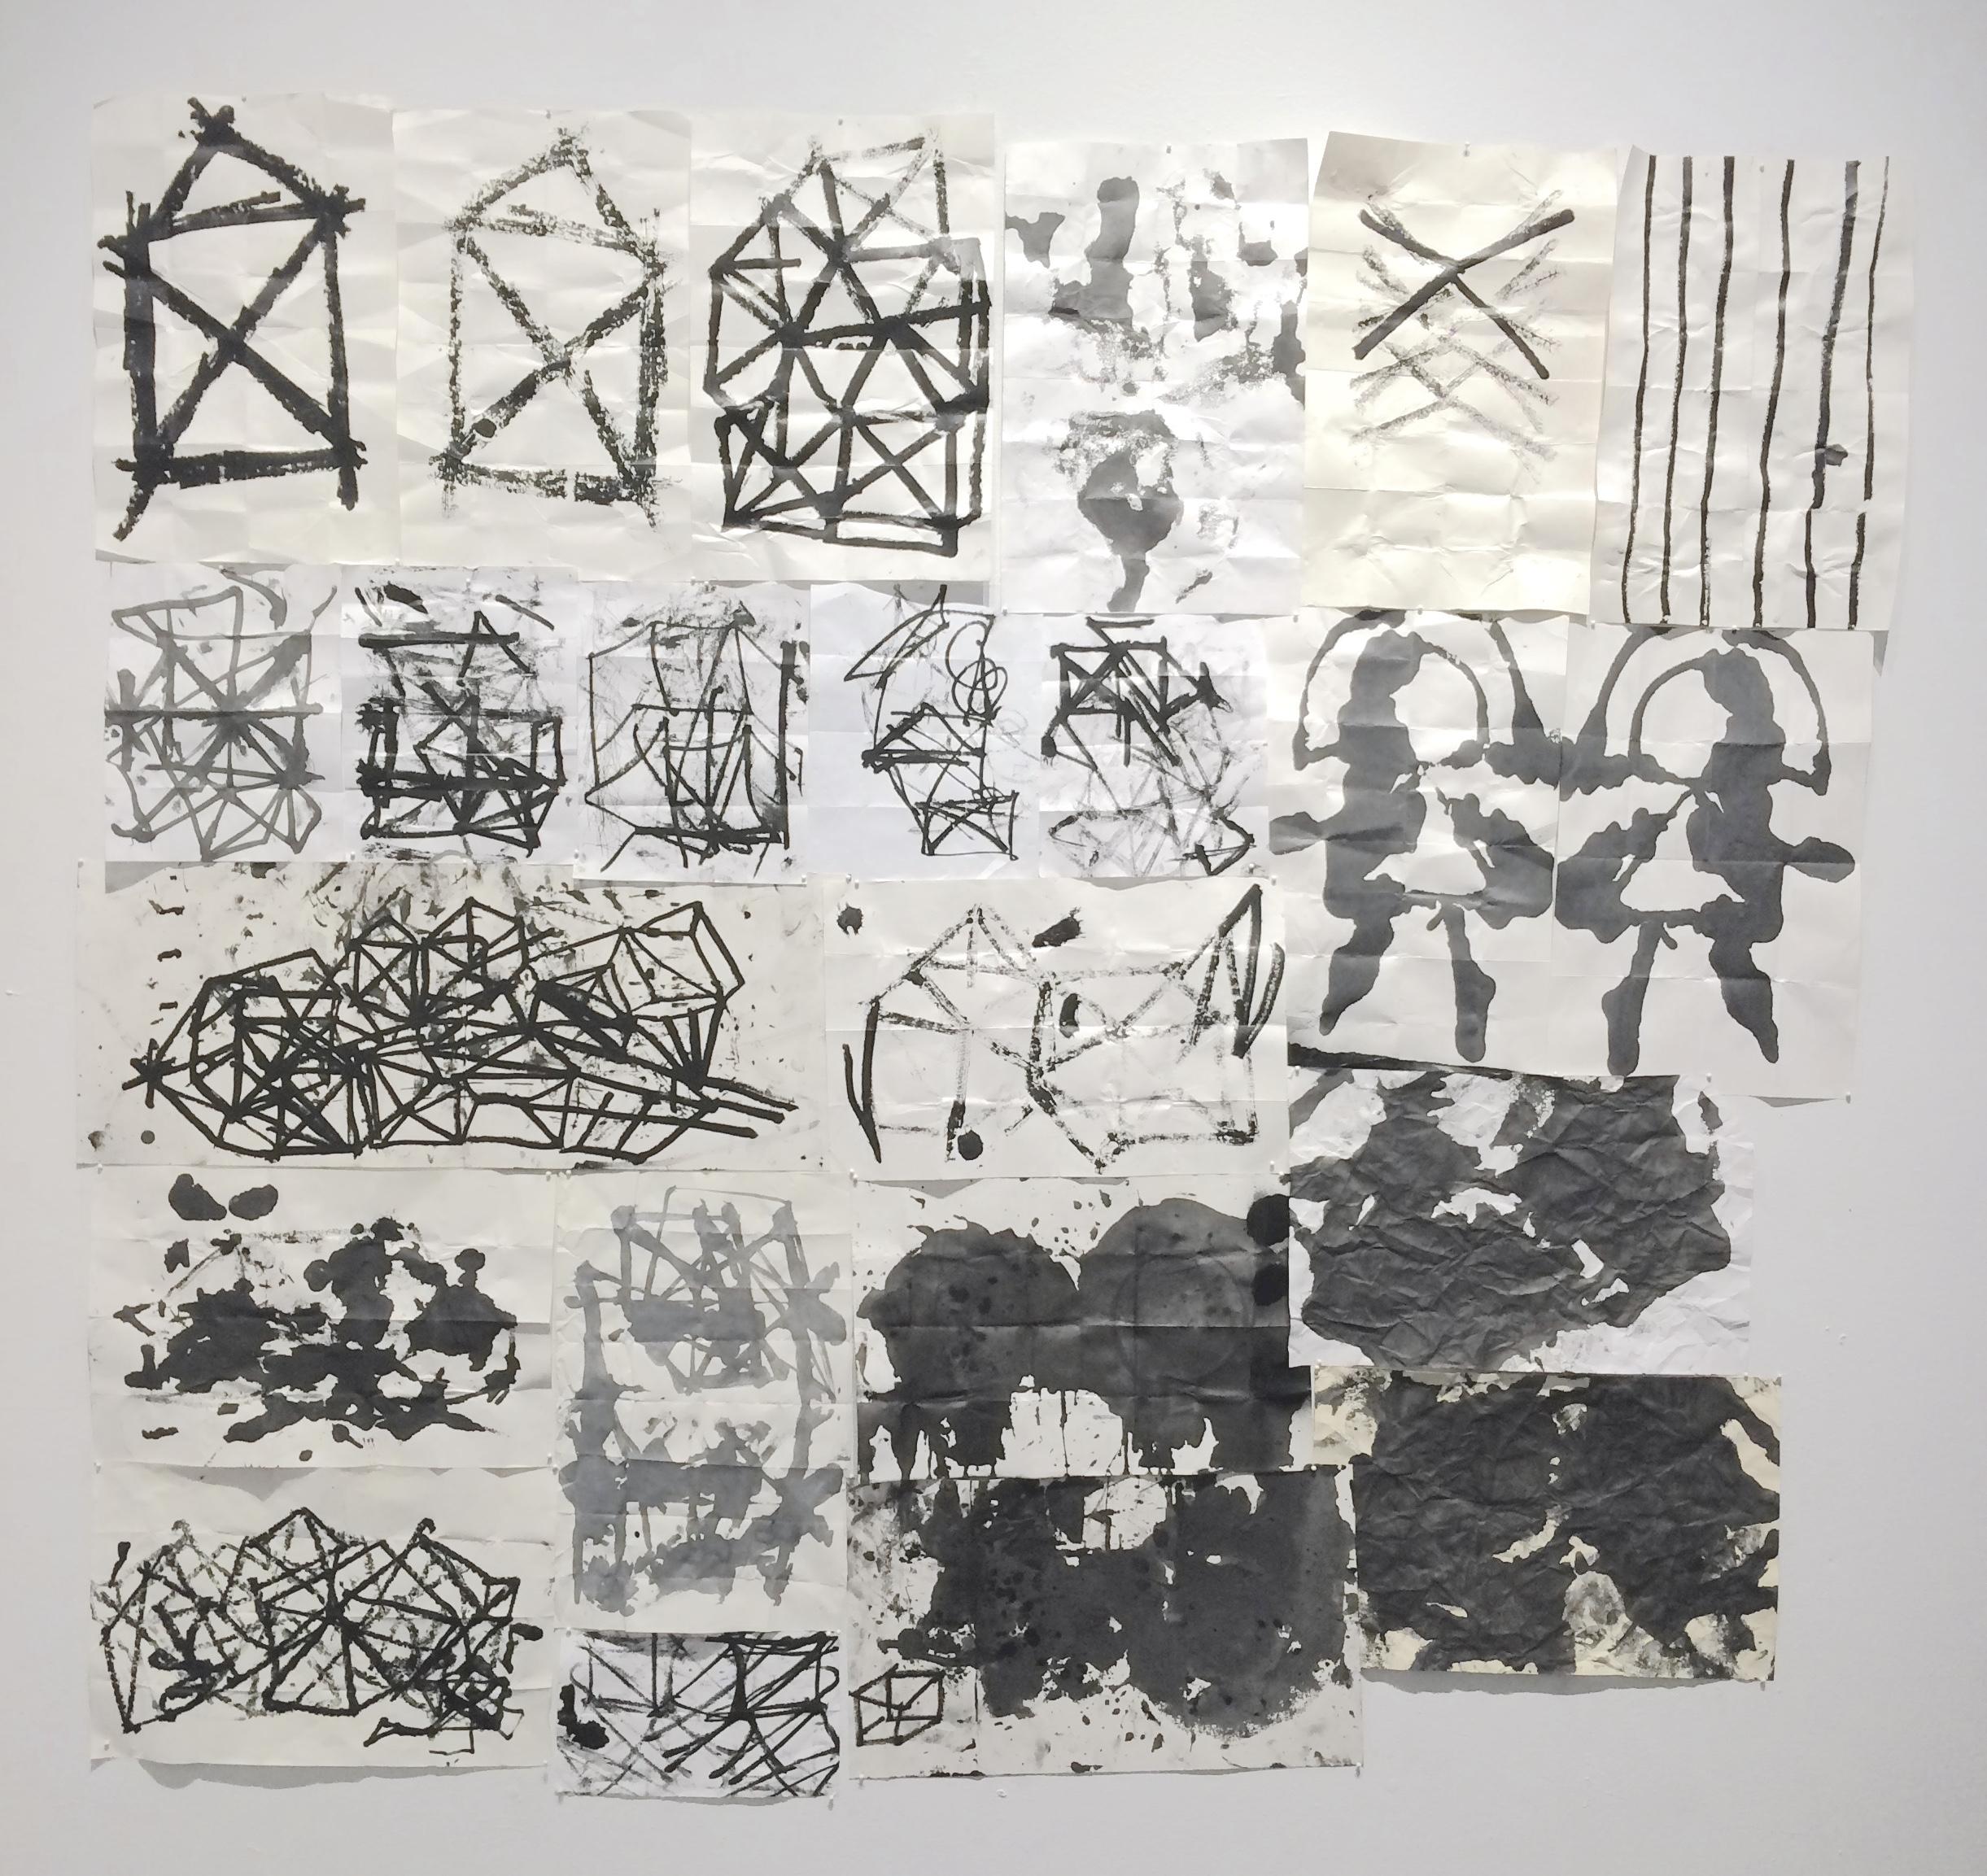 Zachary Garrett / Various / 2017 / Acrylic on paper / various